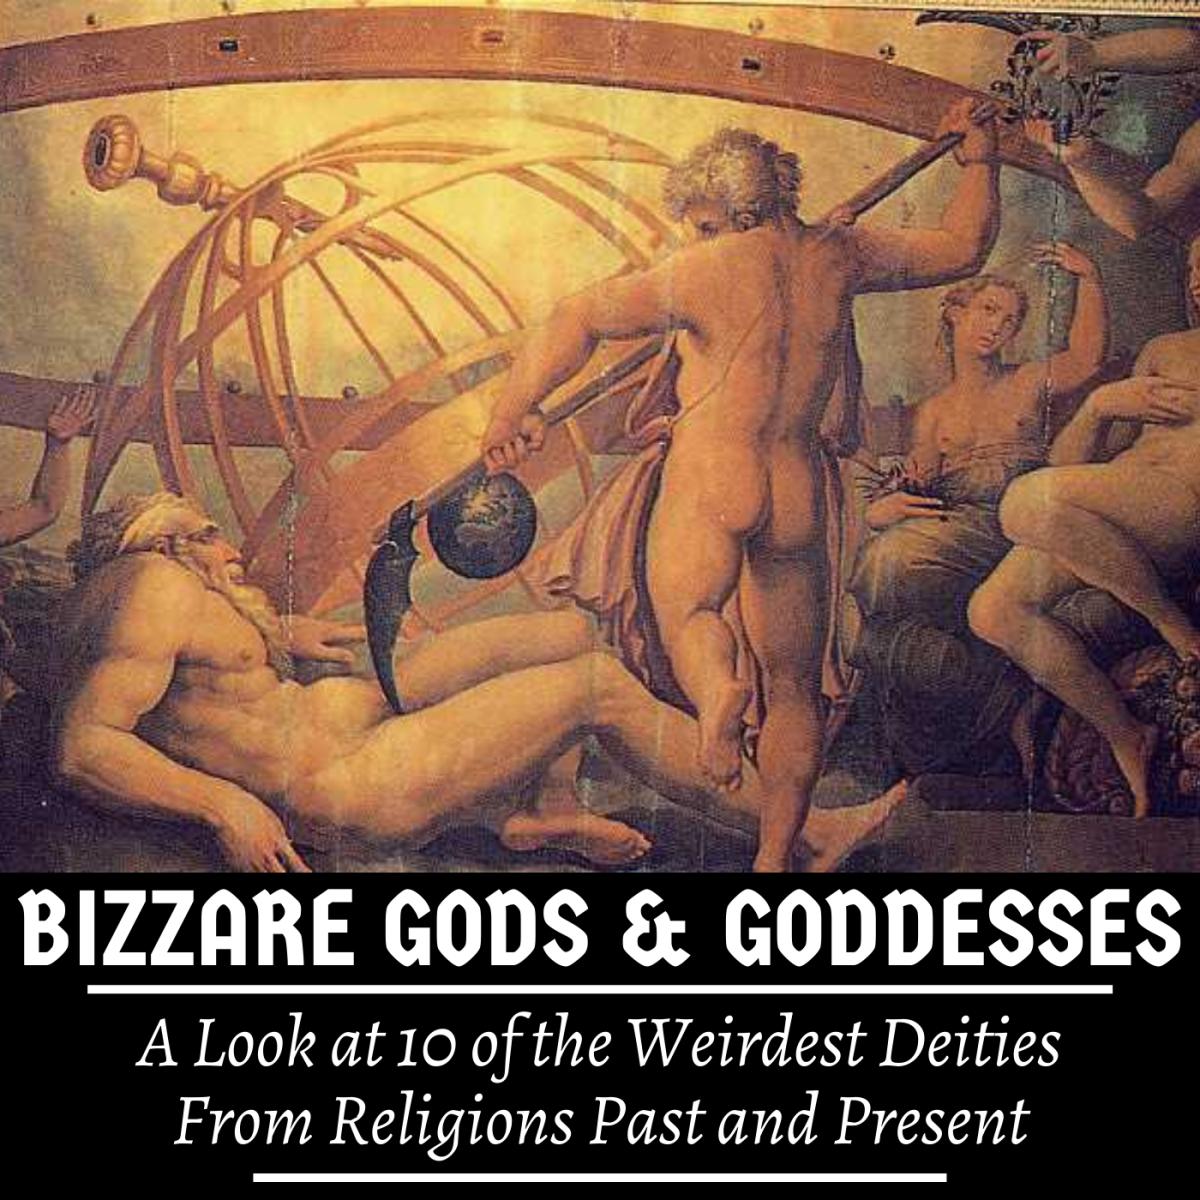 Some of the weirdest gods were Greek. Here, Cronus mutilates his father, Uranus.